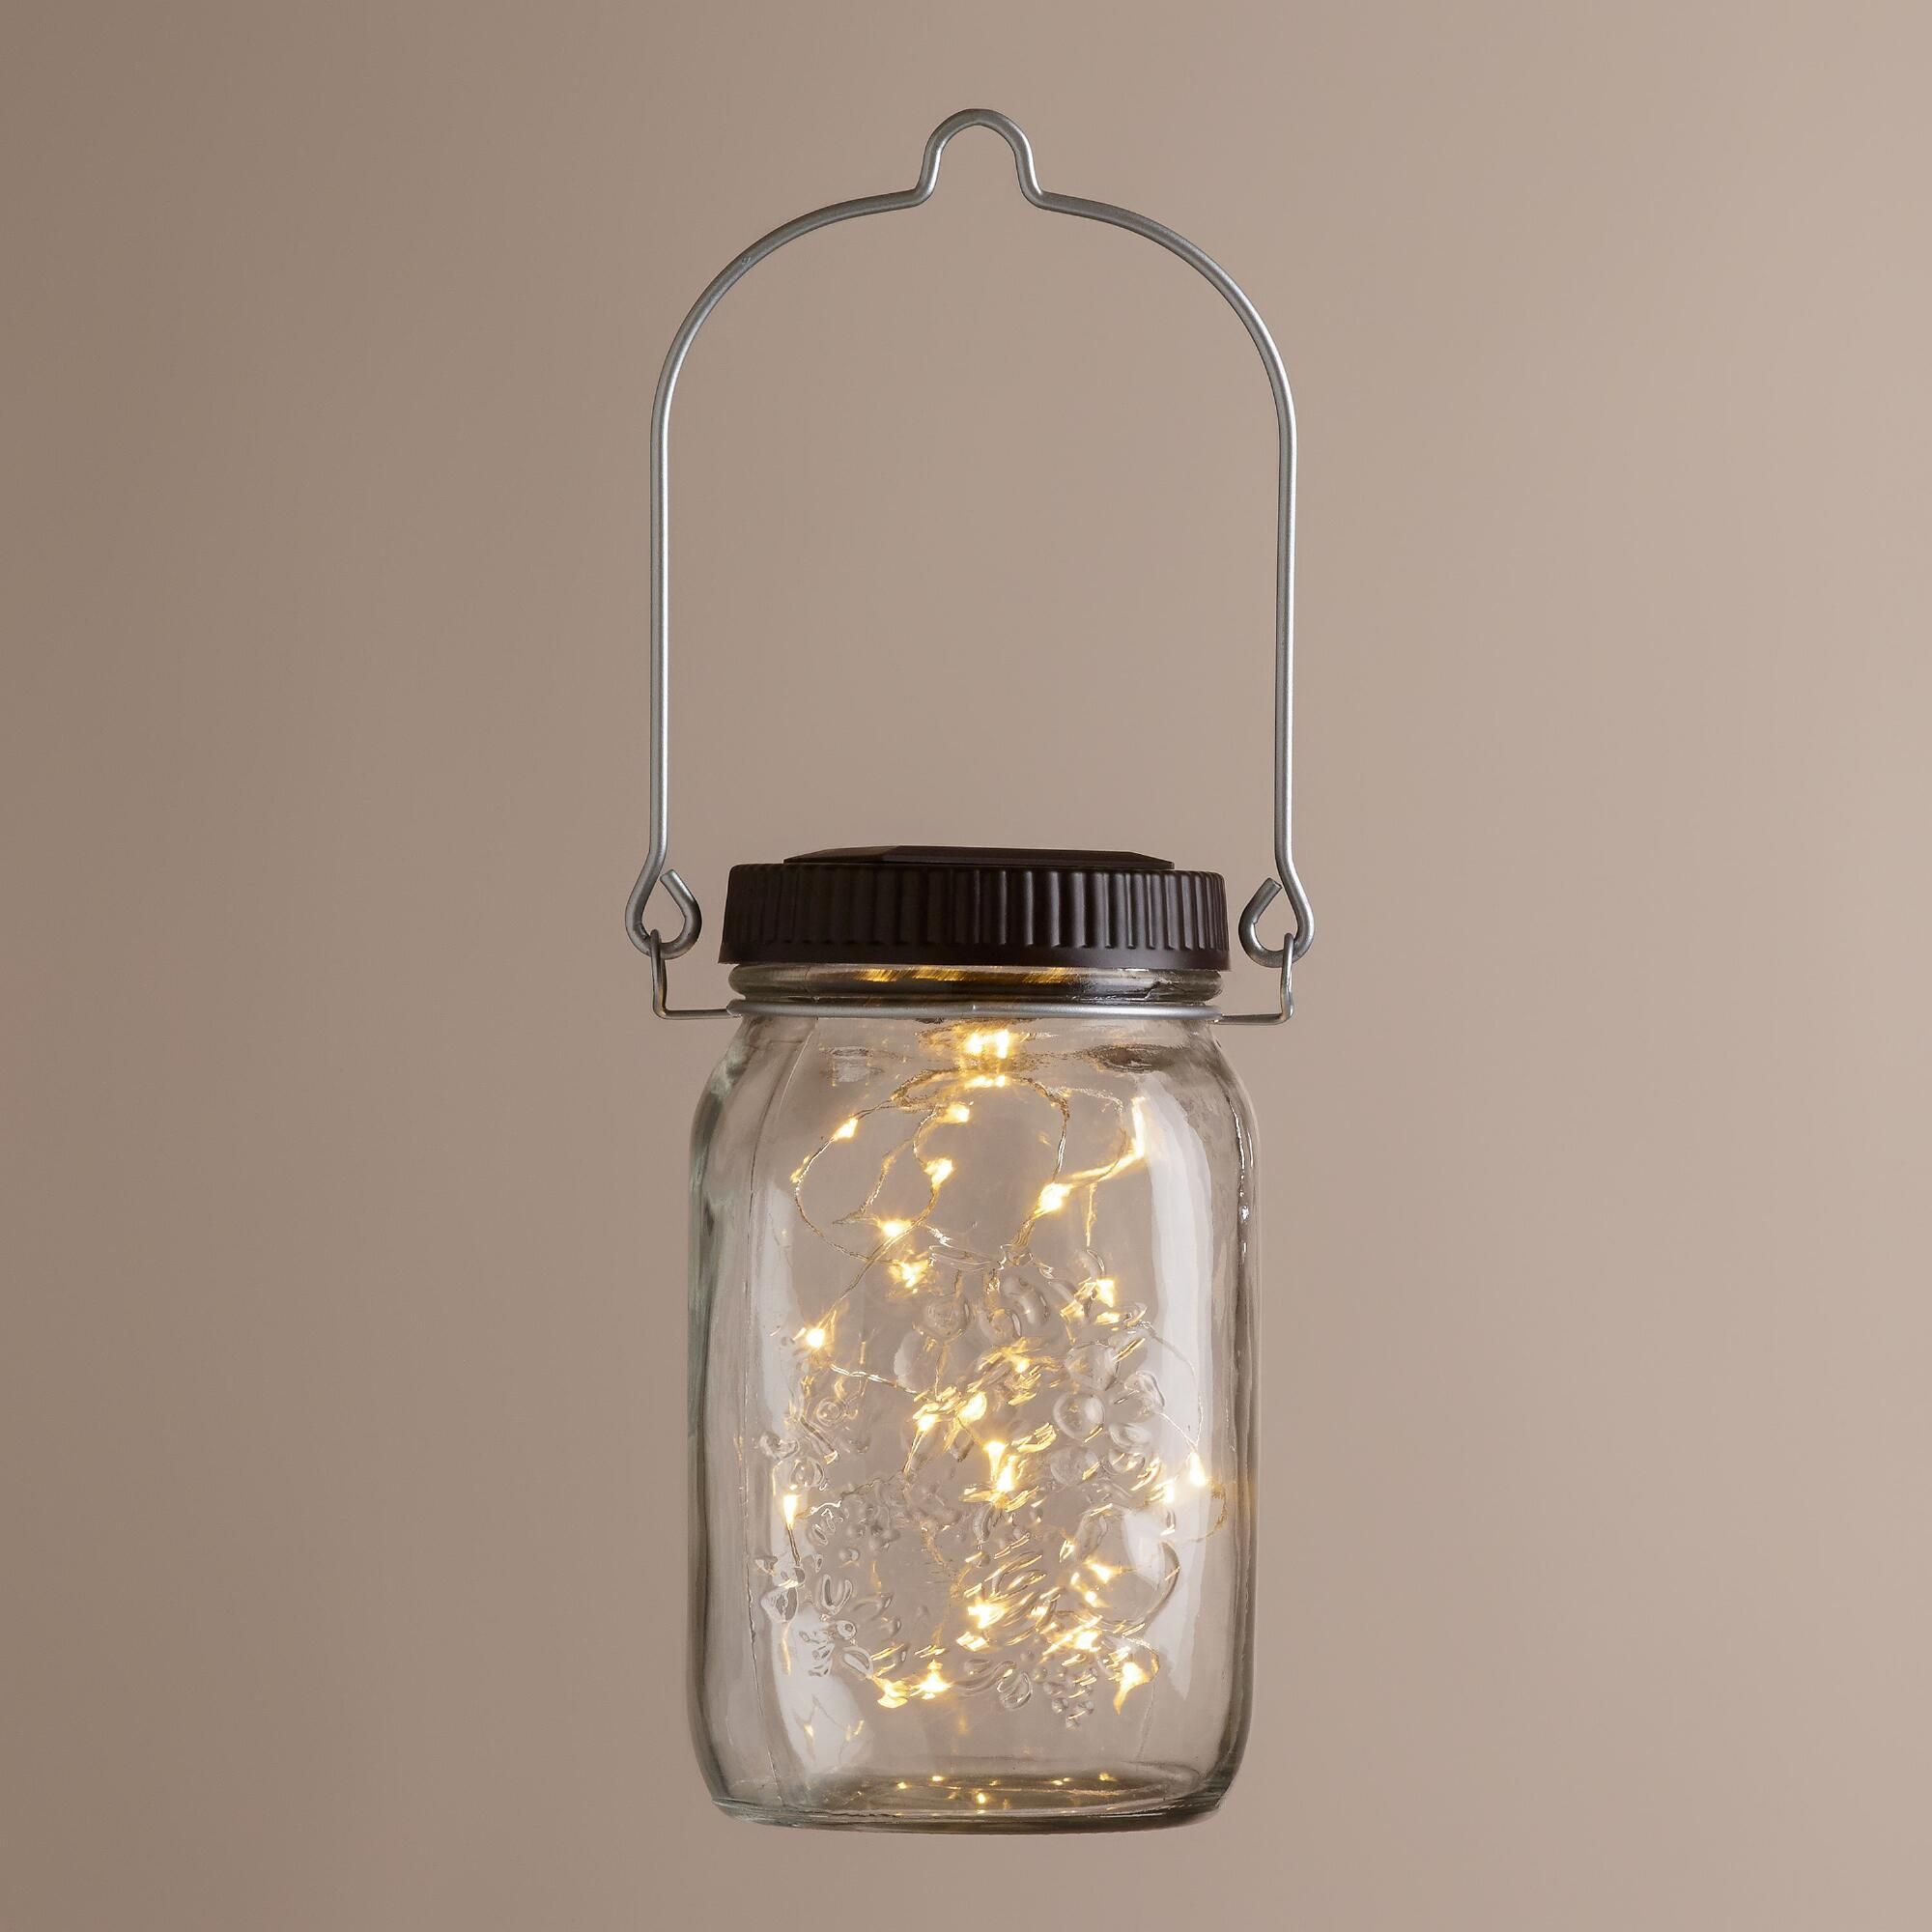 Firefly Solar Led Mason Jar Lantern By World Market